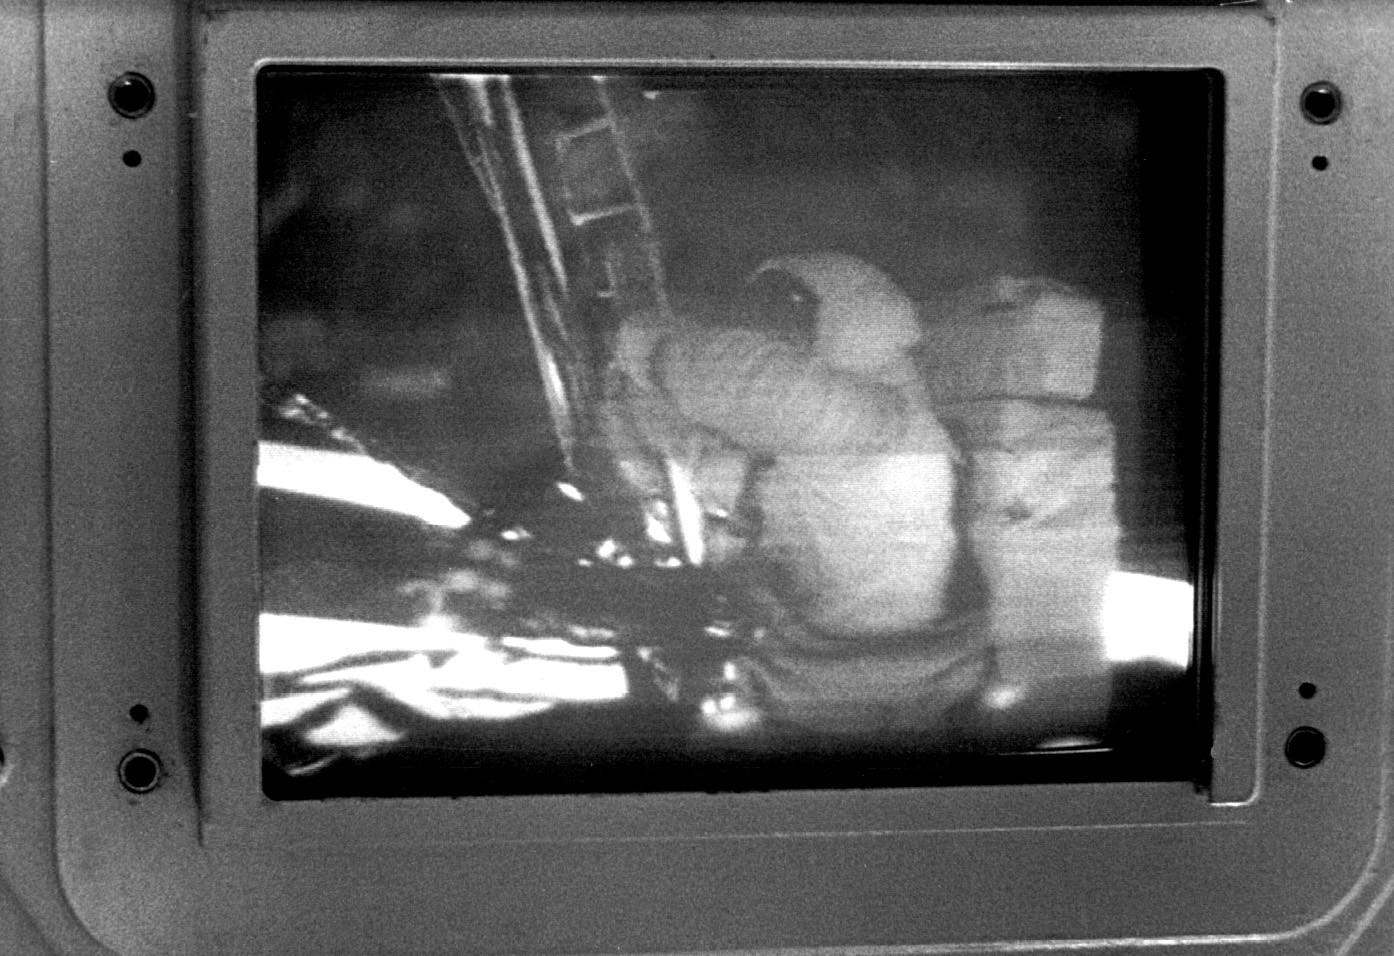 Apollo 11 missing tapes - Wikipedia